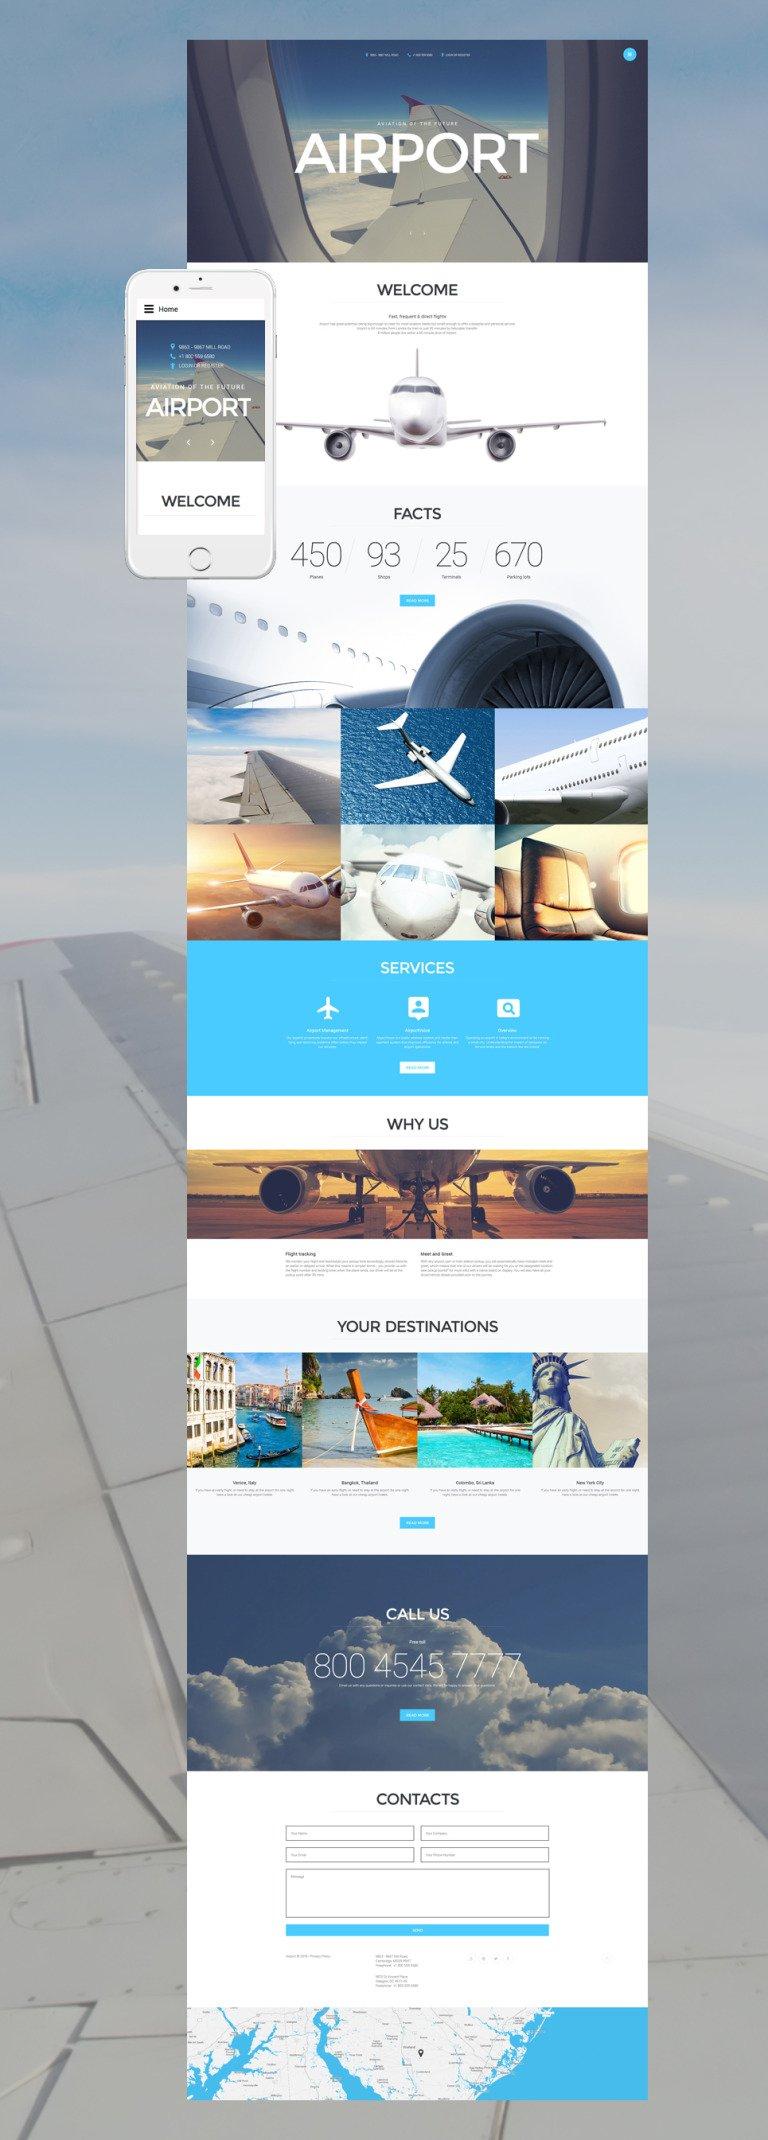 Airport Joomla Template New Screenshots BIG